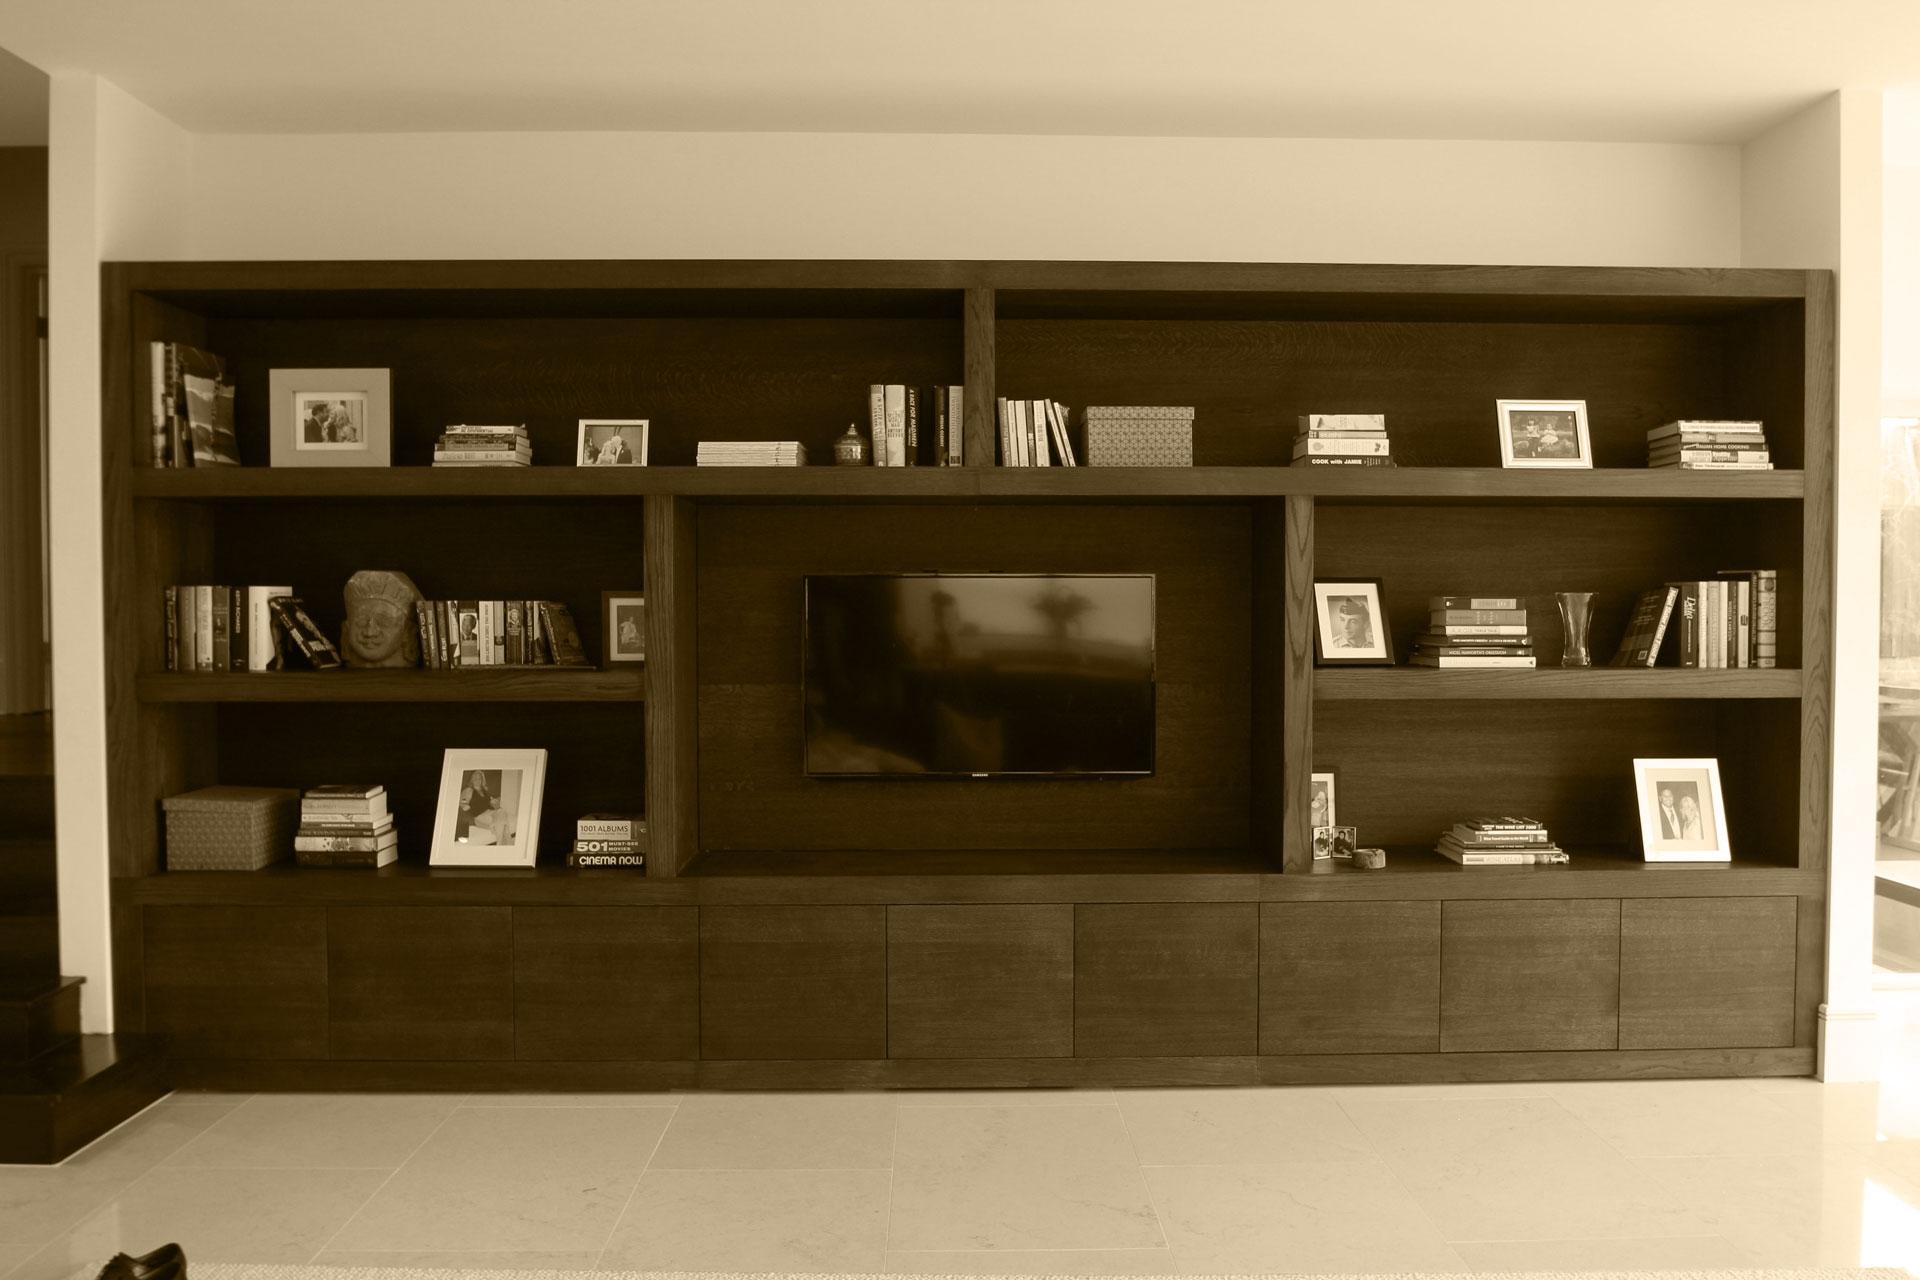 Bespoke Tv Media Units Furniture Design In Surrey For Bespoke Tv Unit (View 5 of 15)